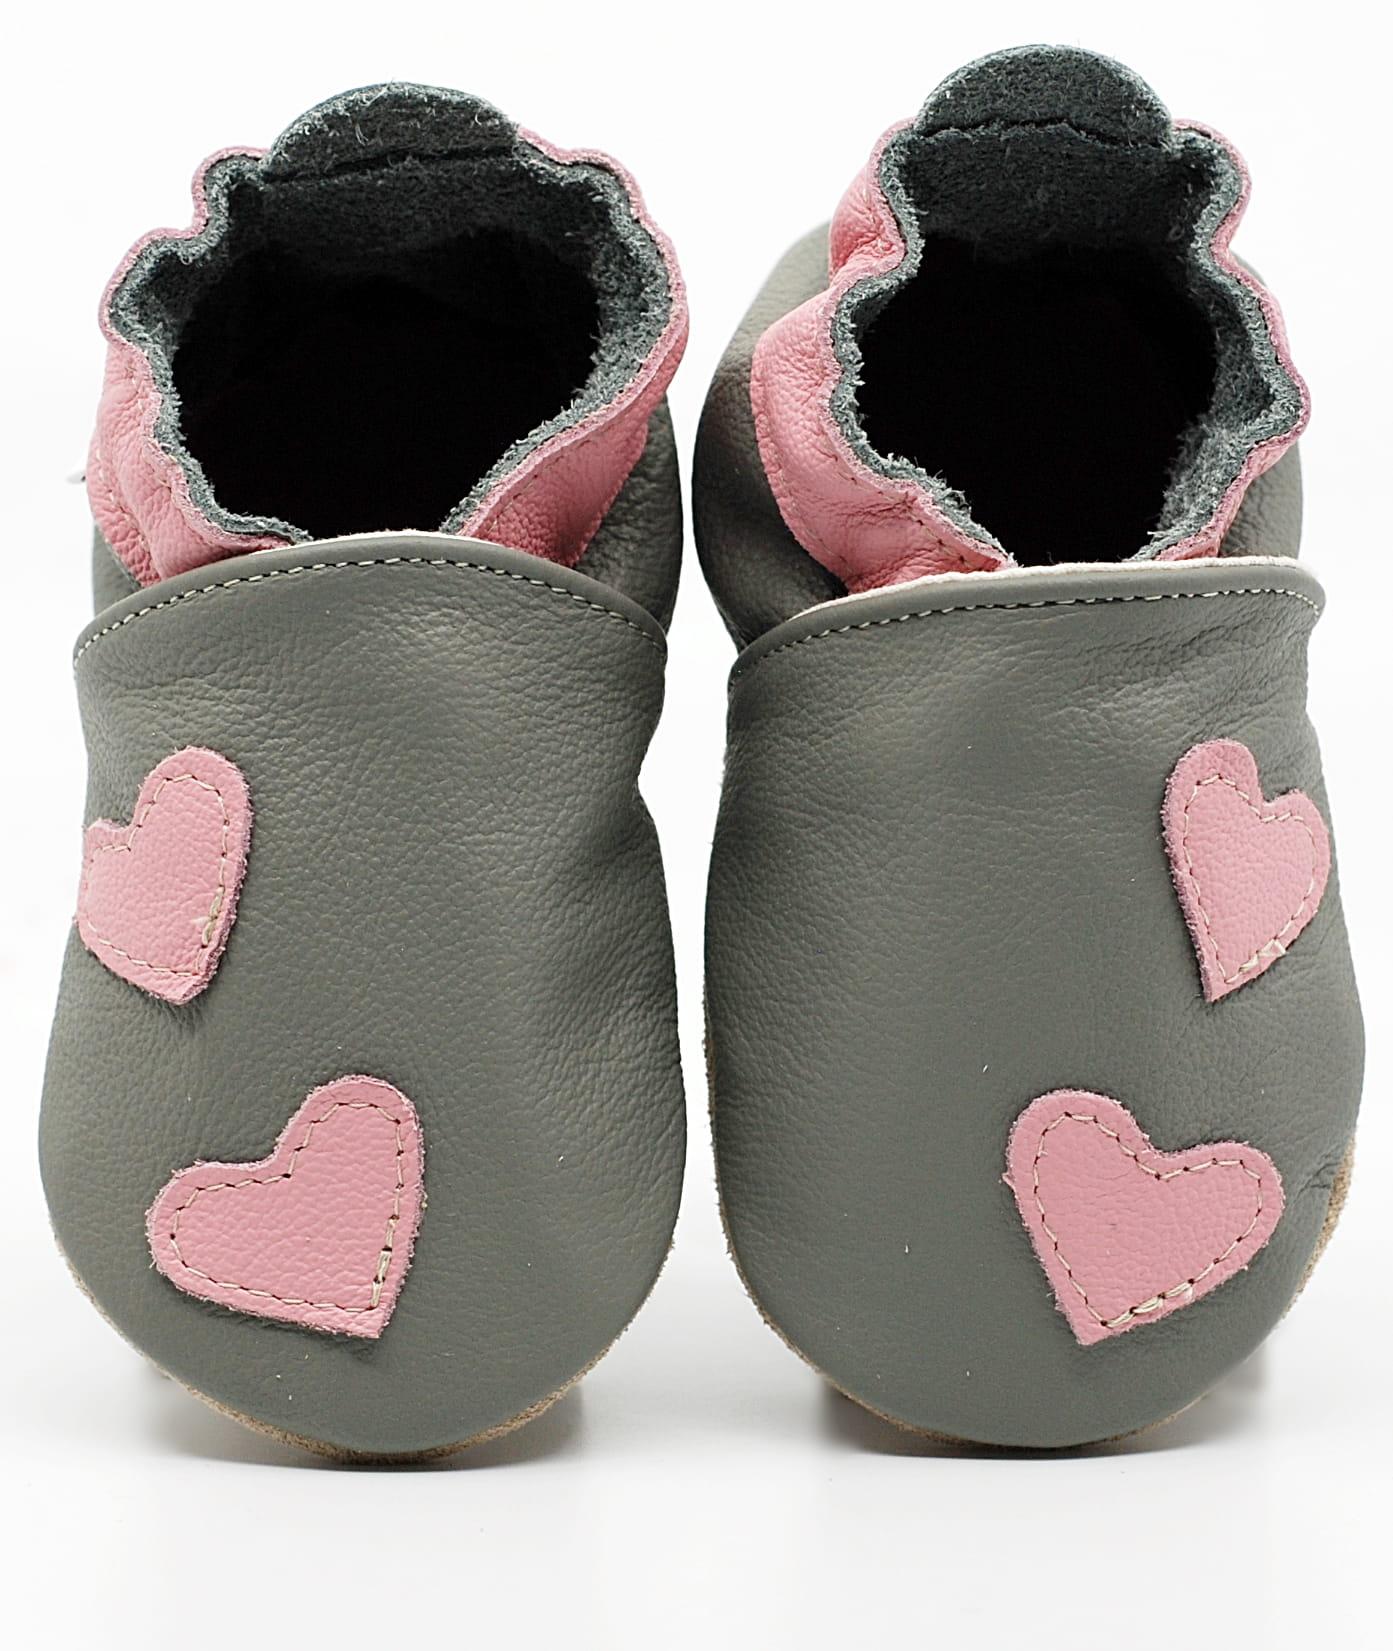 Chaussons en cuir ekoTuptusie - gris et cœurs roses